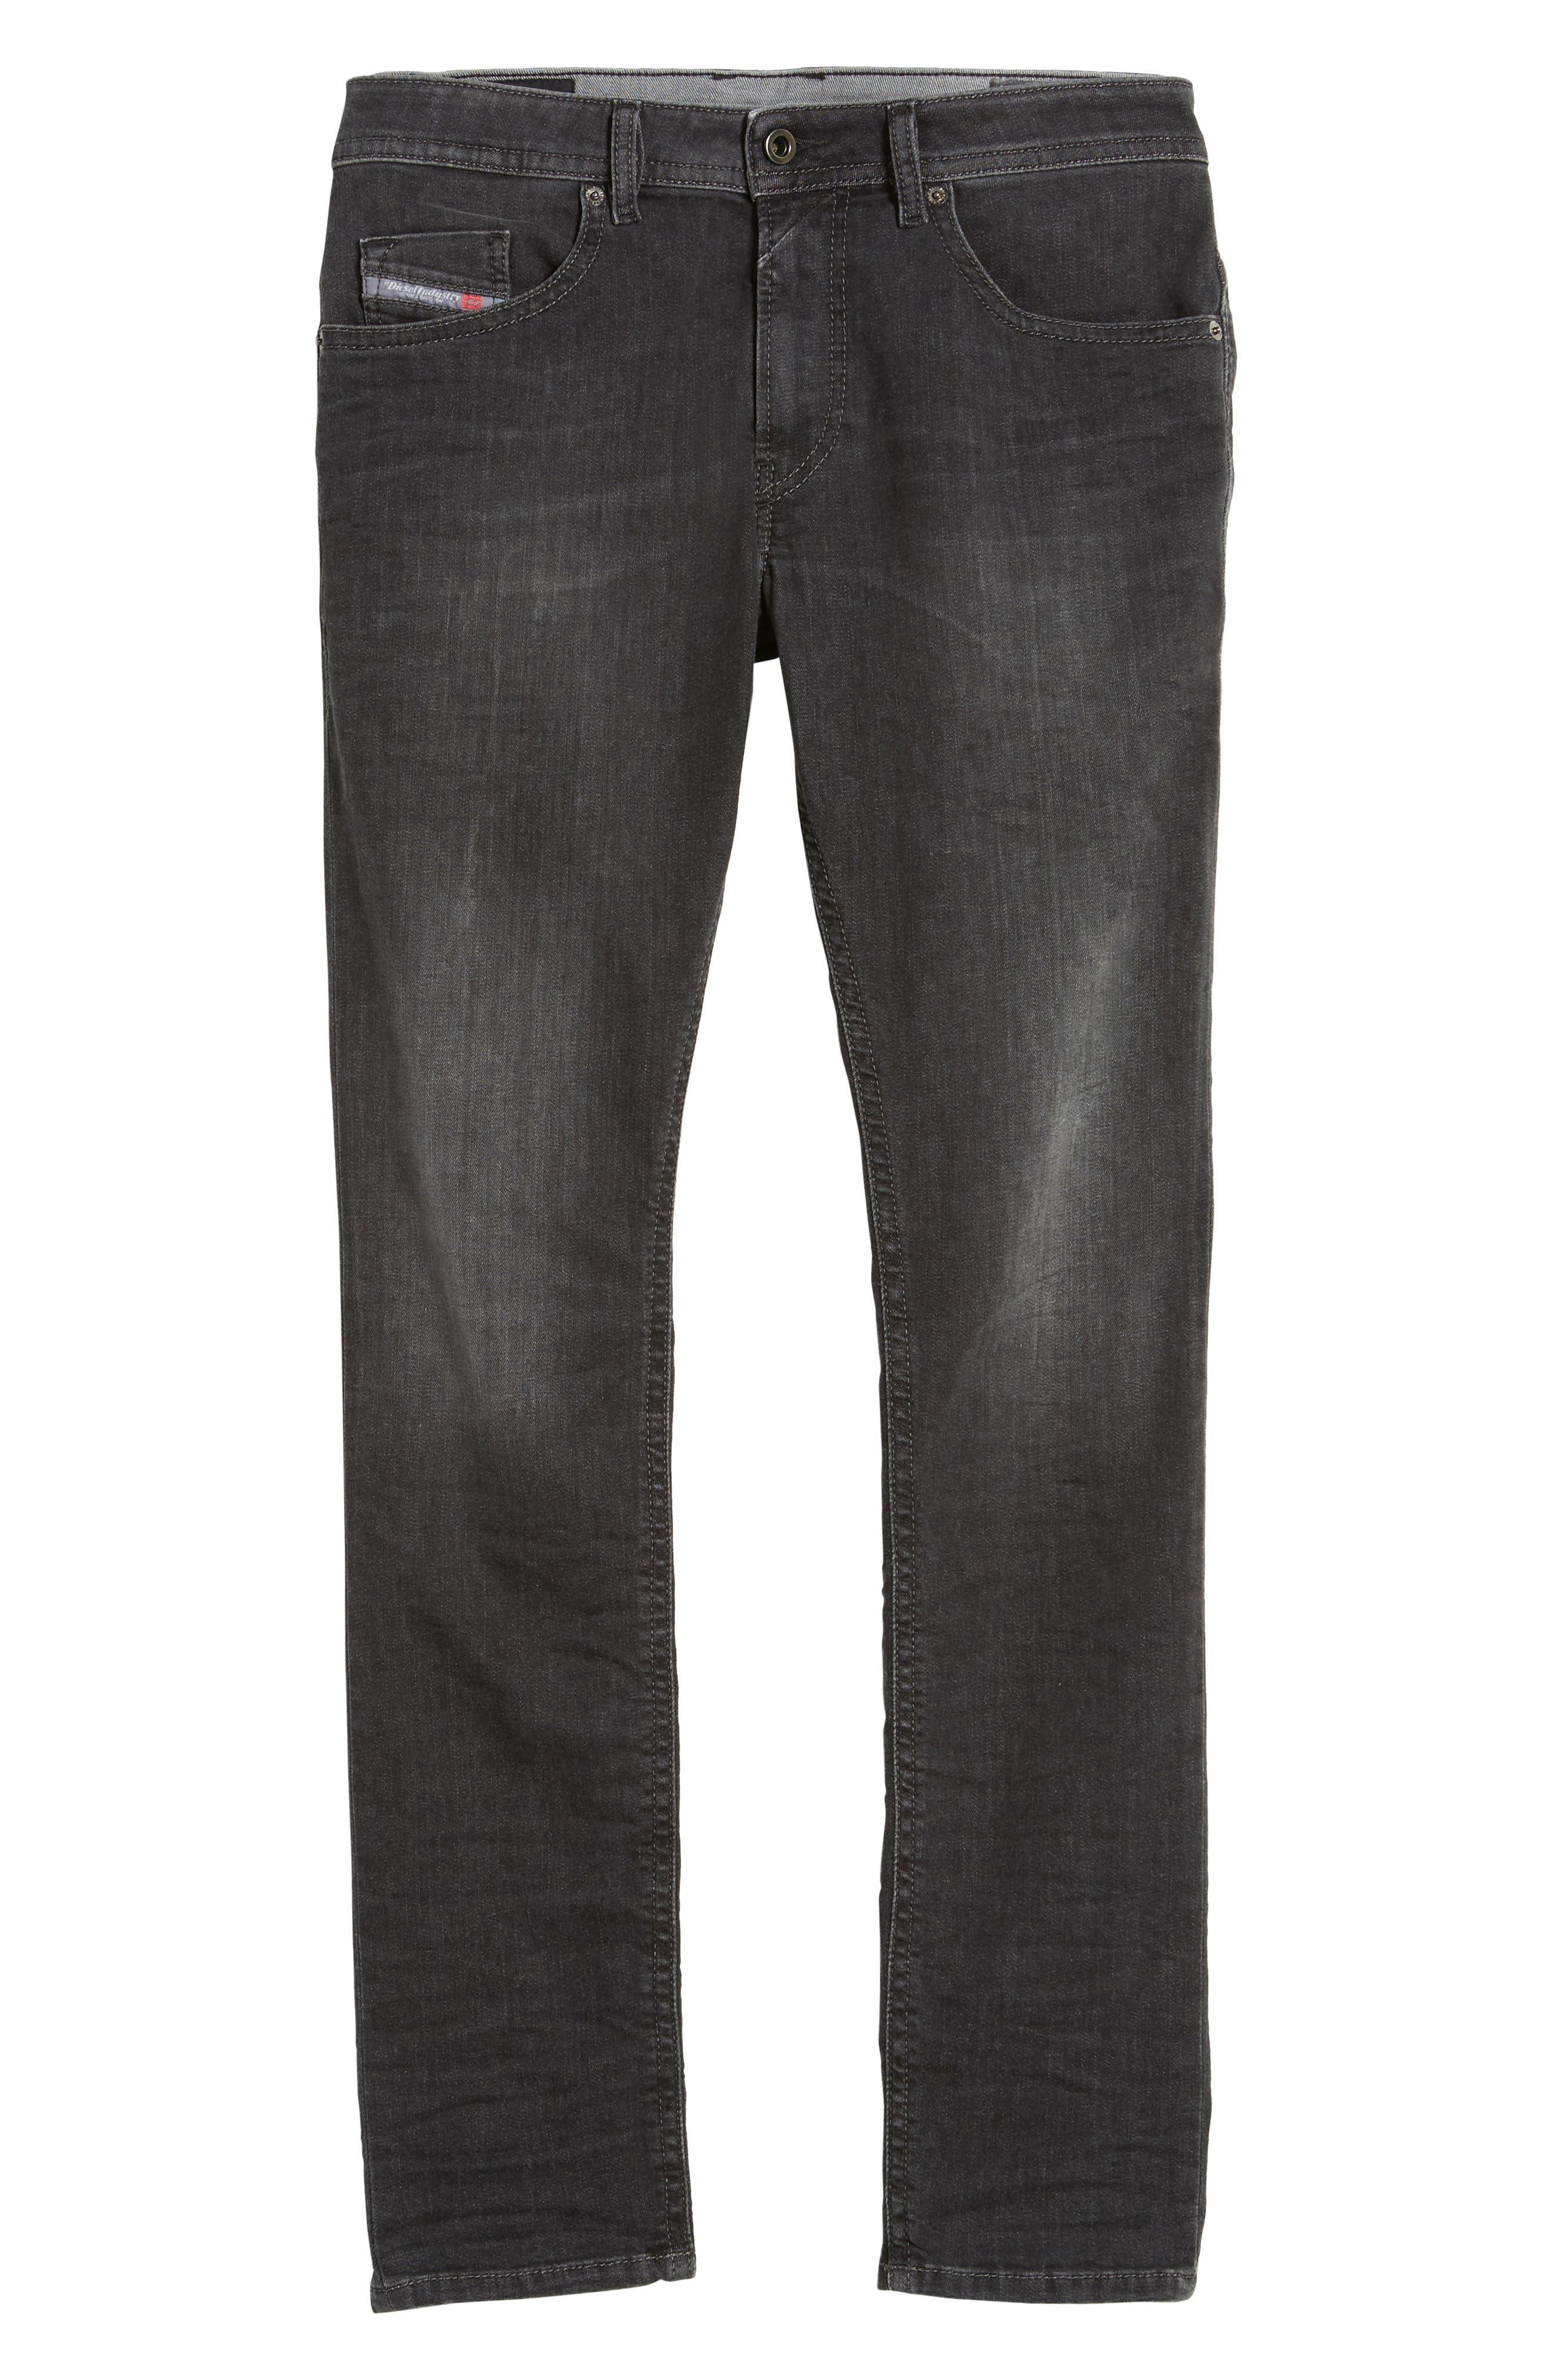 Thommer Slim Fit Jeans,                             Alternate thumbnail 6, color,                             001